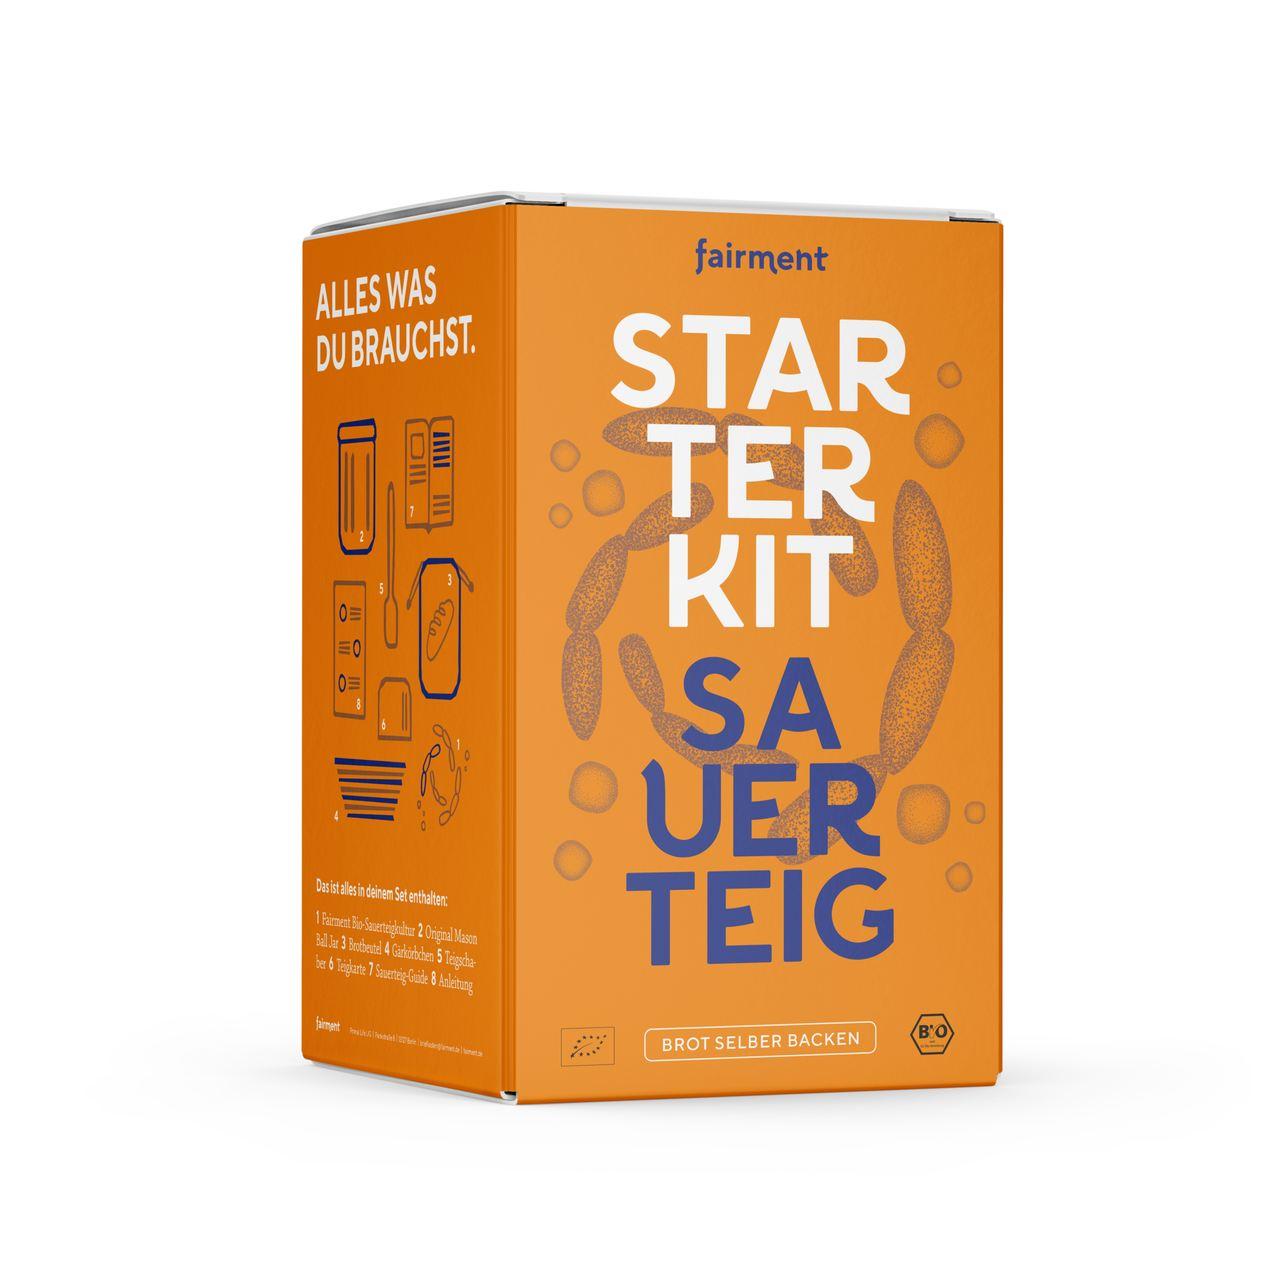 Sauerteig Fairment Starter Kit